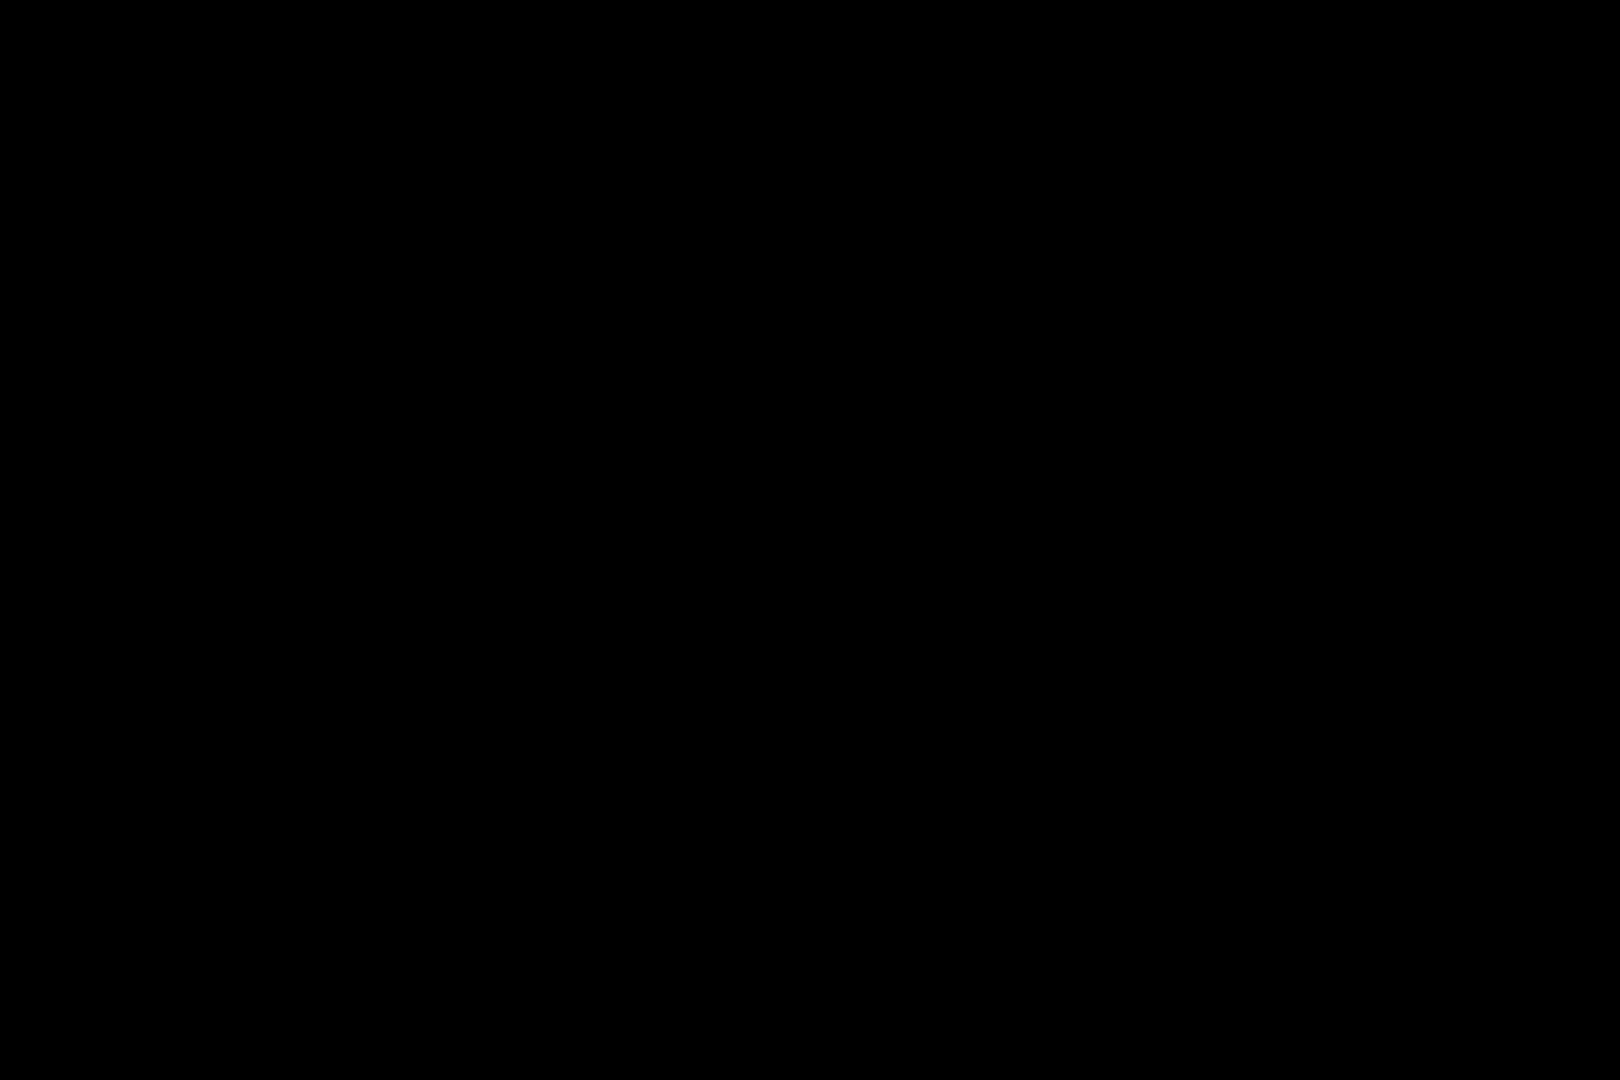 H大好き!全身性感帯四十路人妻~山本ちあき~ フェラ のぞき動画画像 96PIX 8